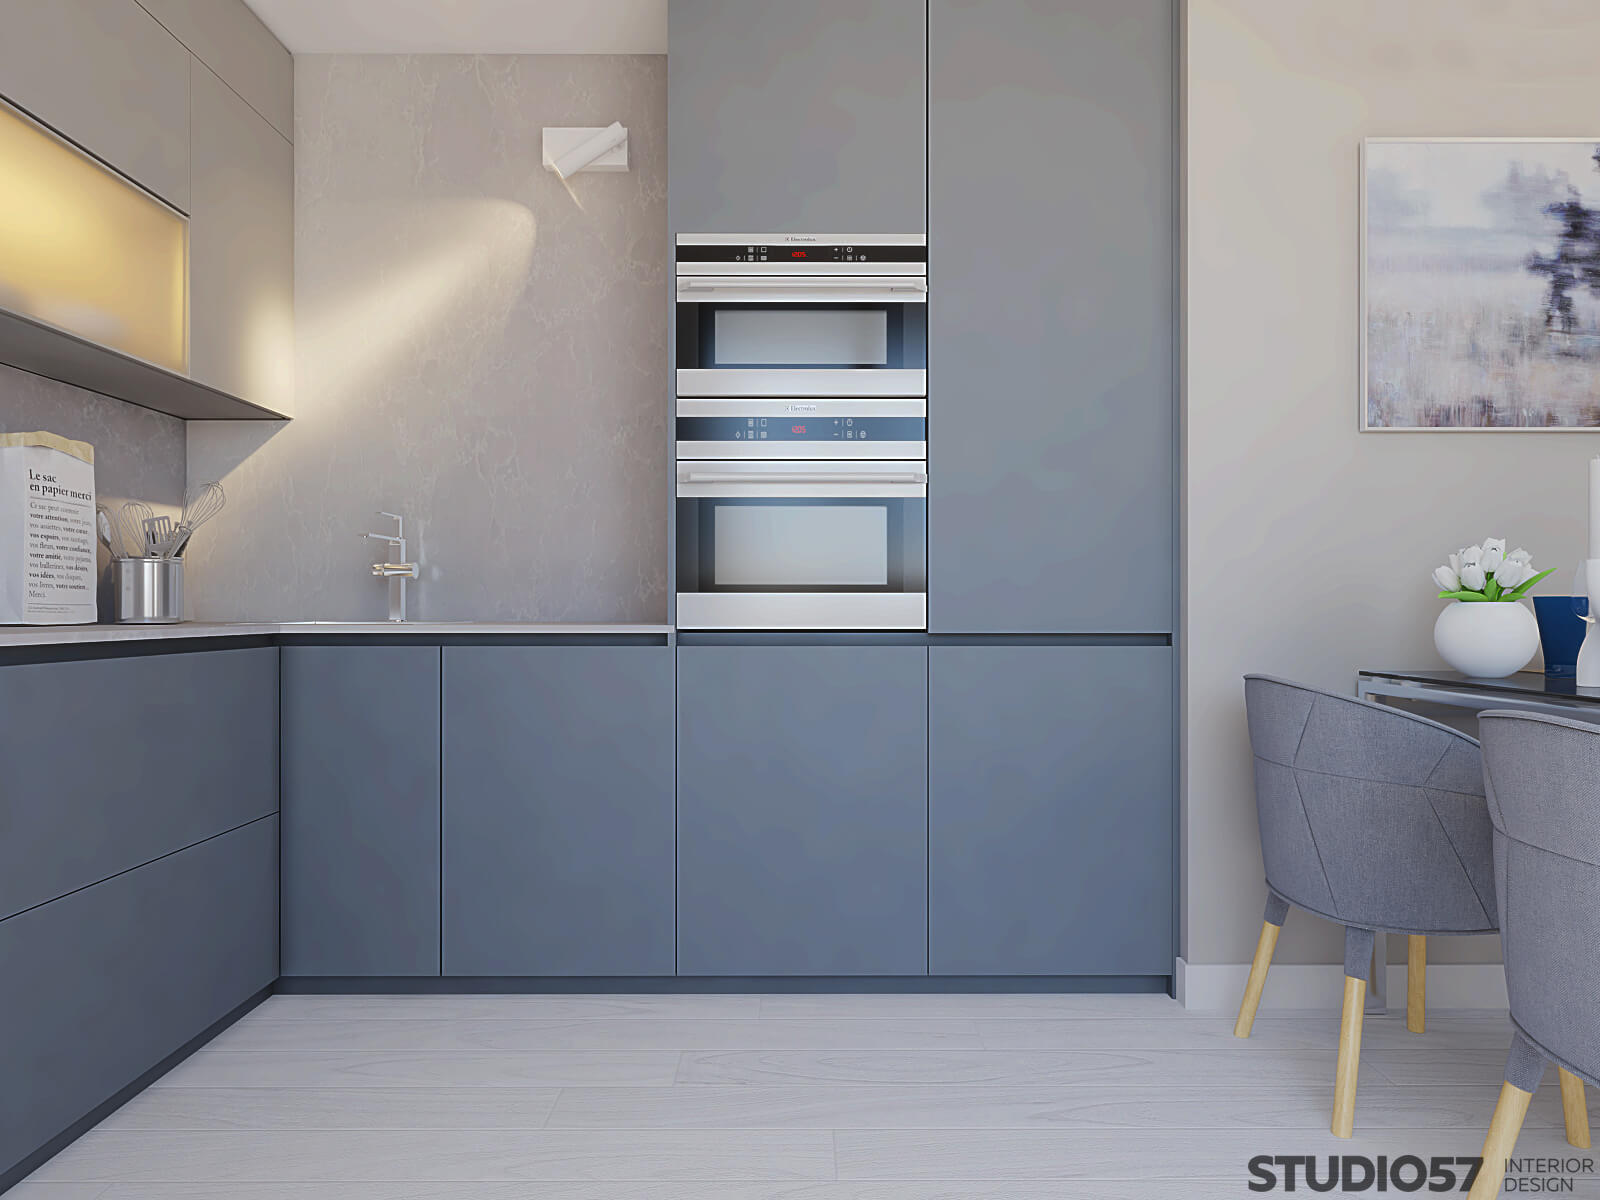 Kitchen interior in blue color